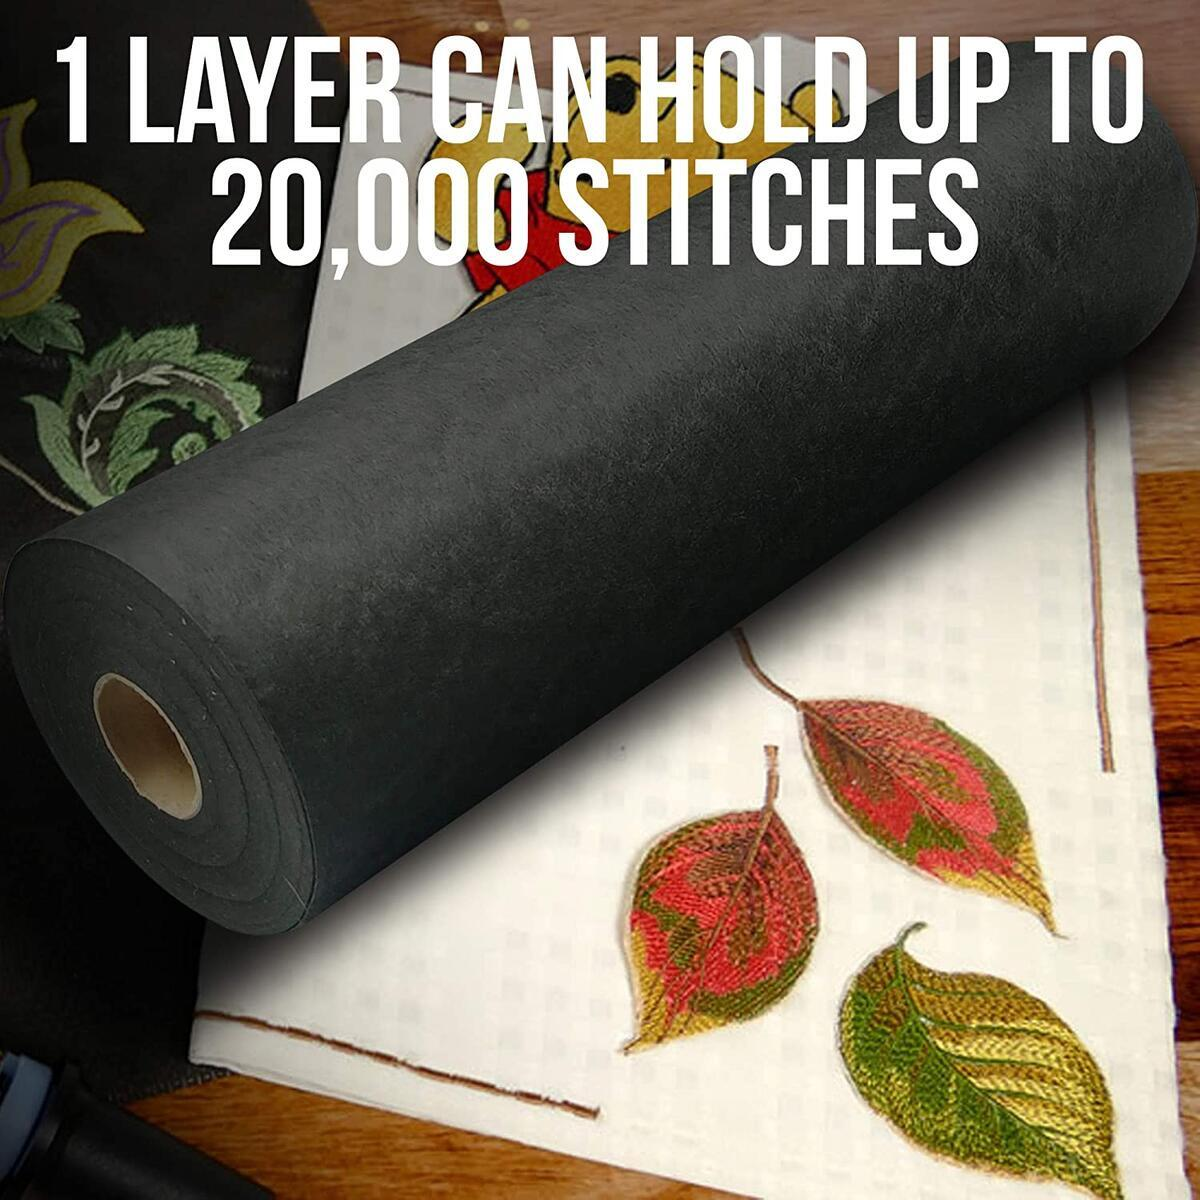 "[Premium] Cutaway Embroidery Stabilizer 15"" x 26 Yards, Cut-Away Stabilizer for Machine Embroidery with Free Pen & Scissors, Medium 70gsm Polymesh Stabilizer, Cut Away Embroidery Backing (Black)"